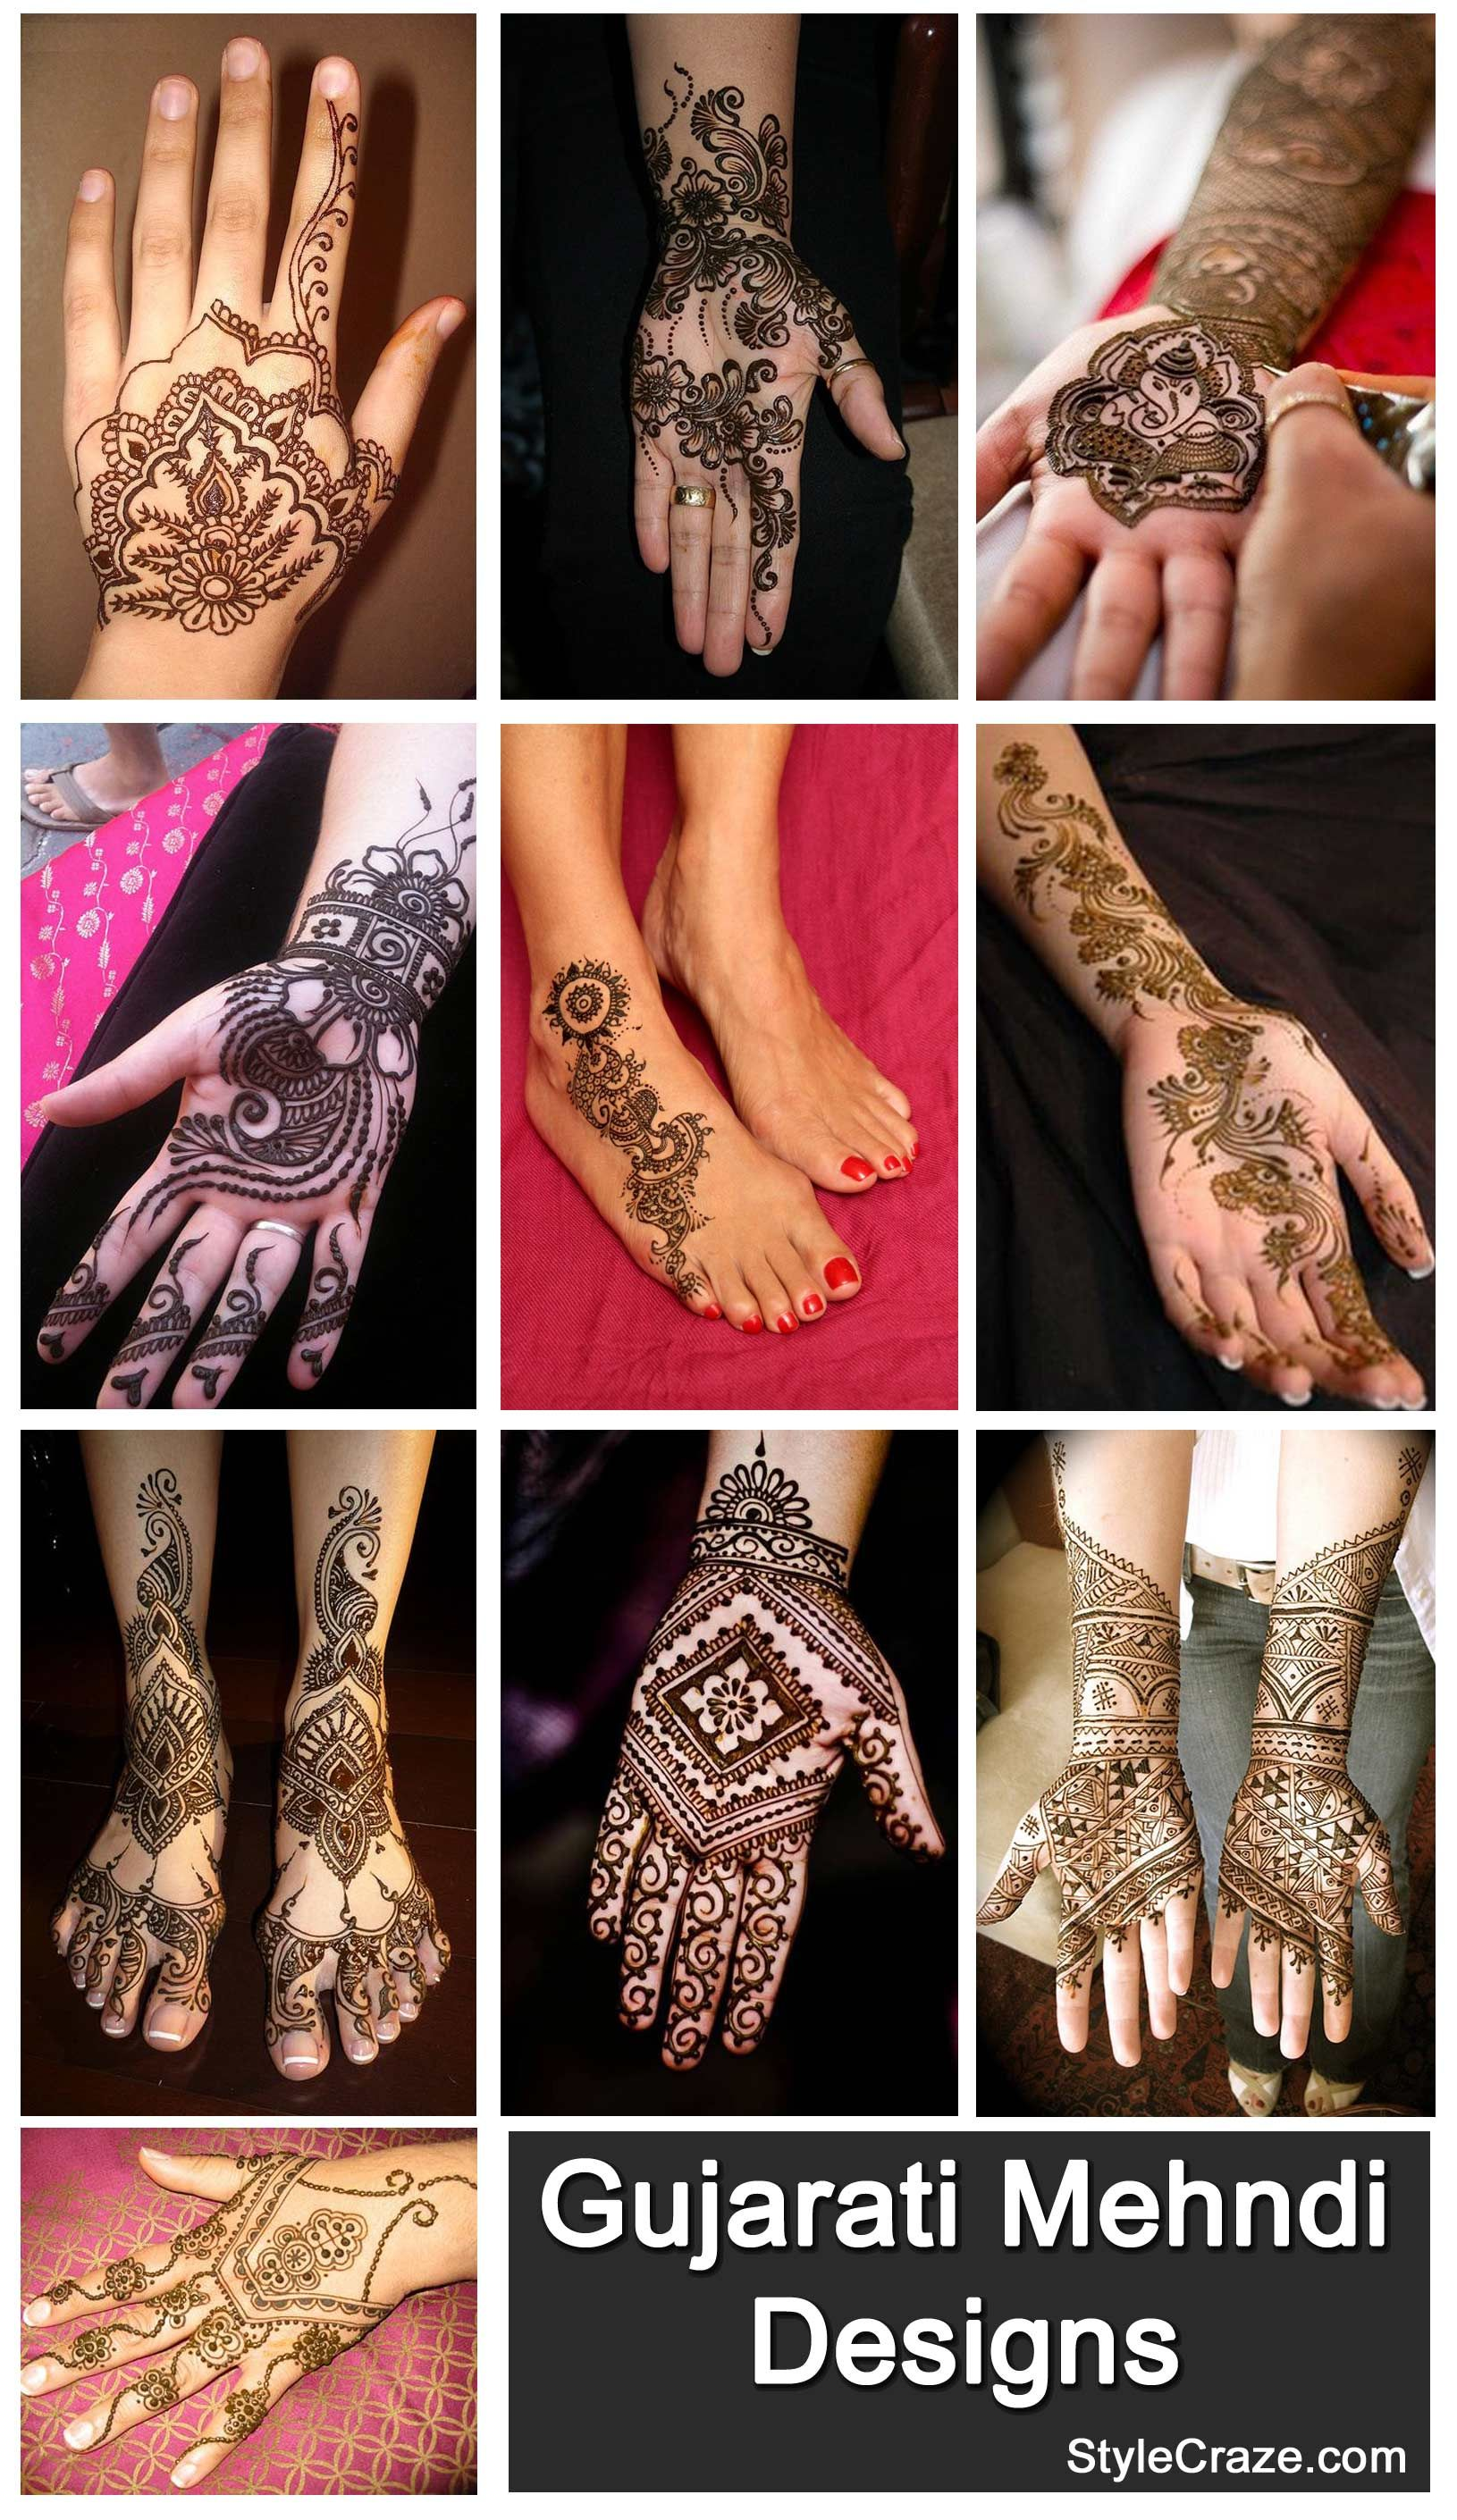 Top 10 beautiful arabic mehndi design art - Best Gujarati Mehndi Designs Our Top 10